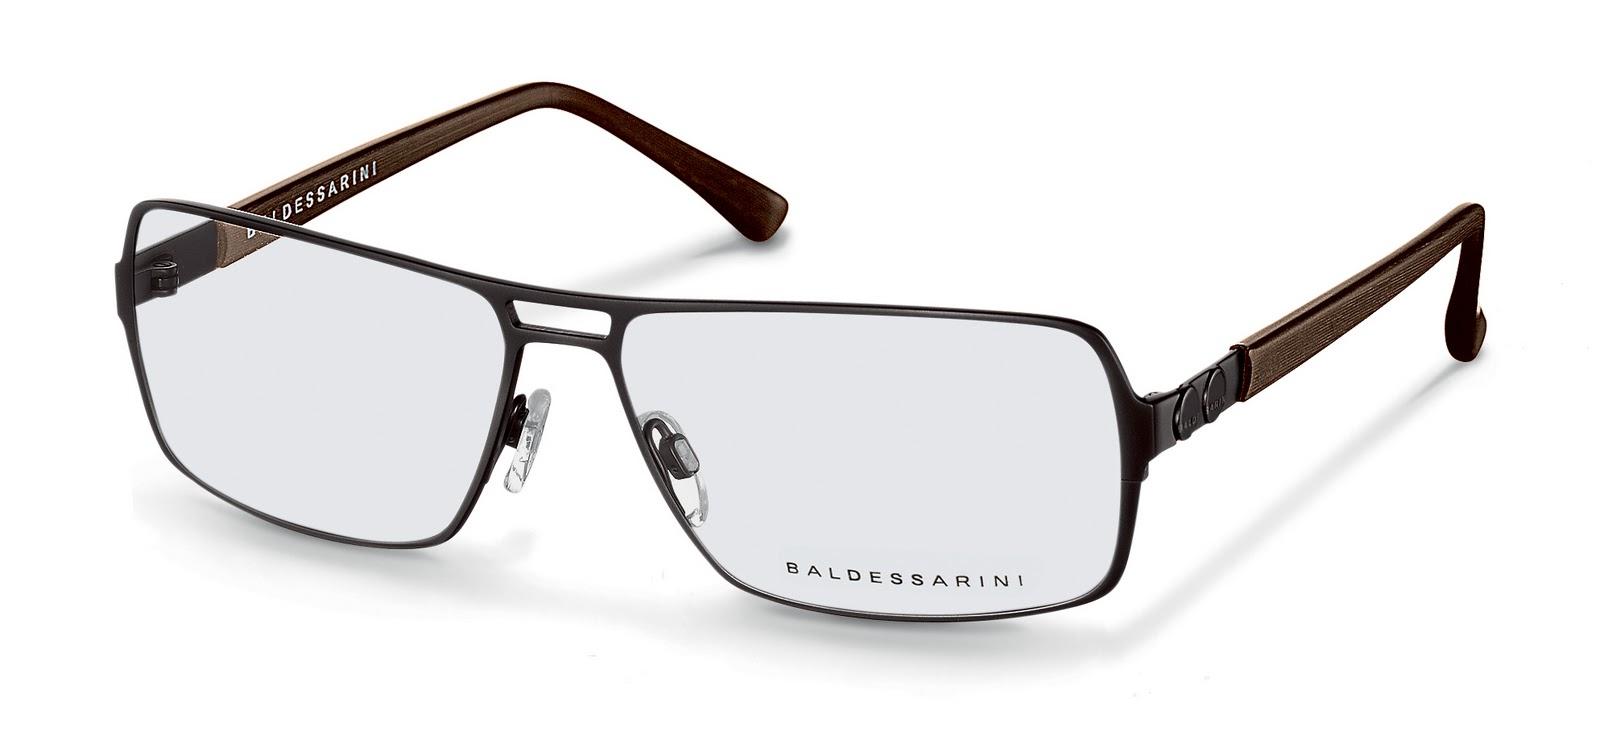 Vision Opticals Tirunelveli Nagercoil Models